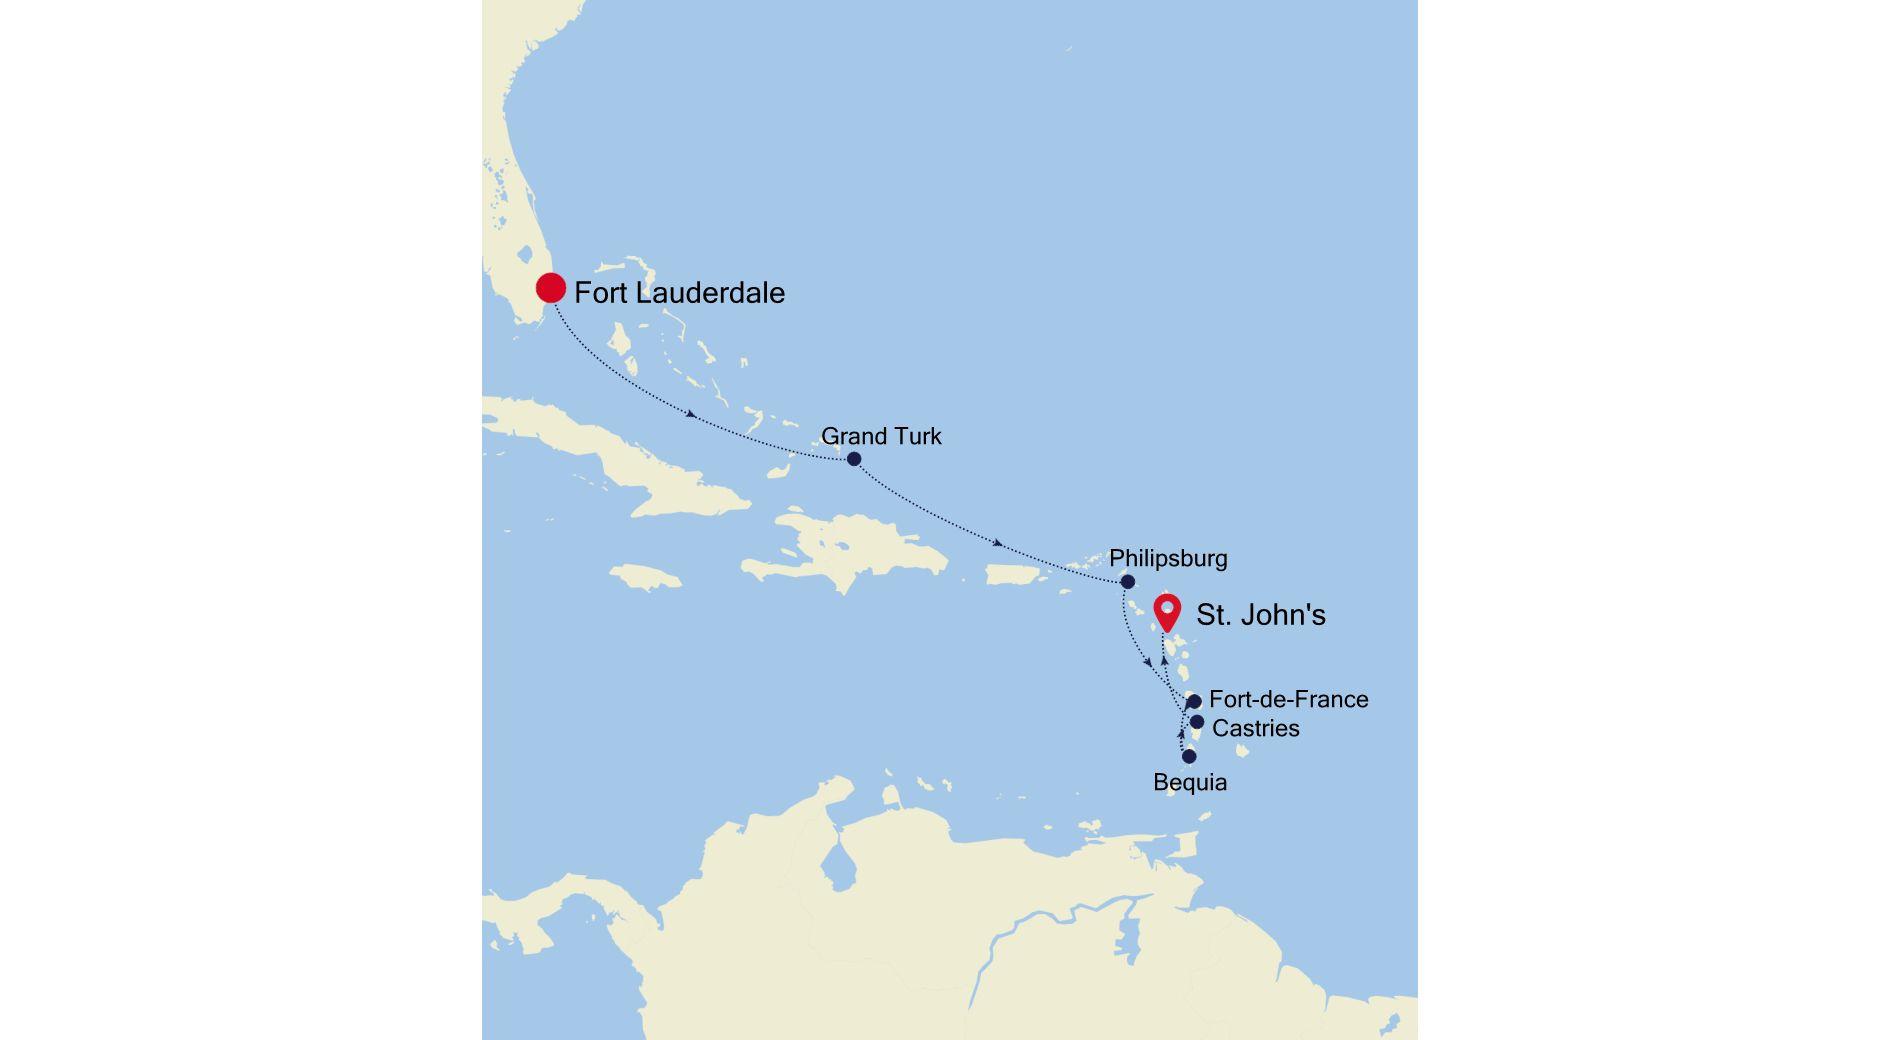 4931A - Fort Lauderdale a St. John's